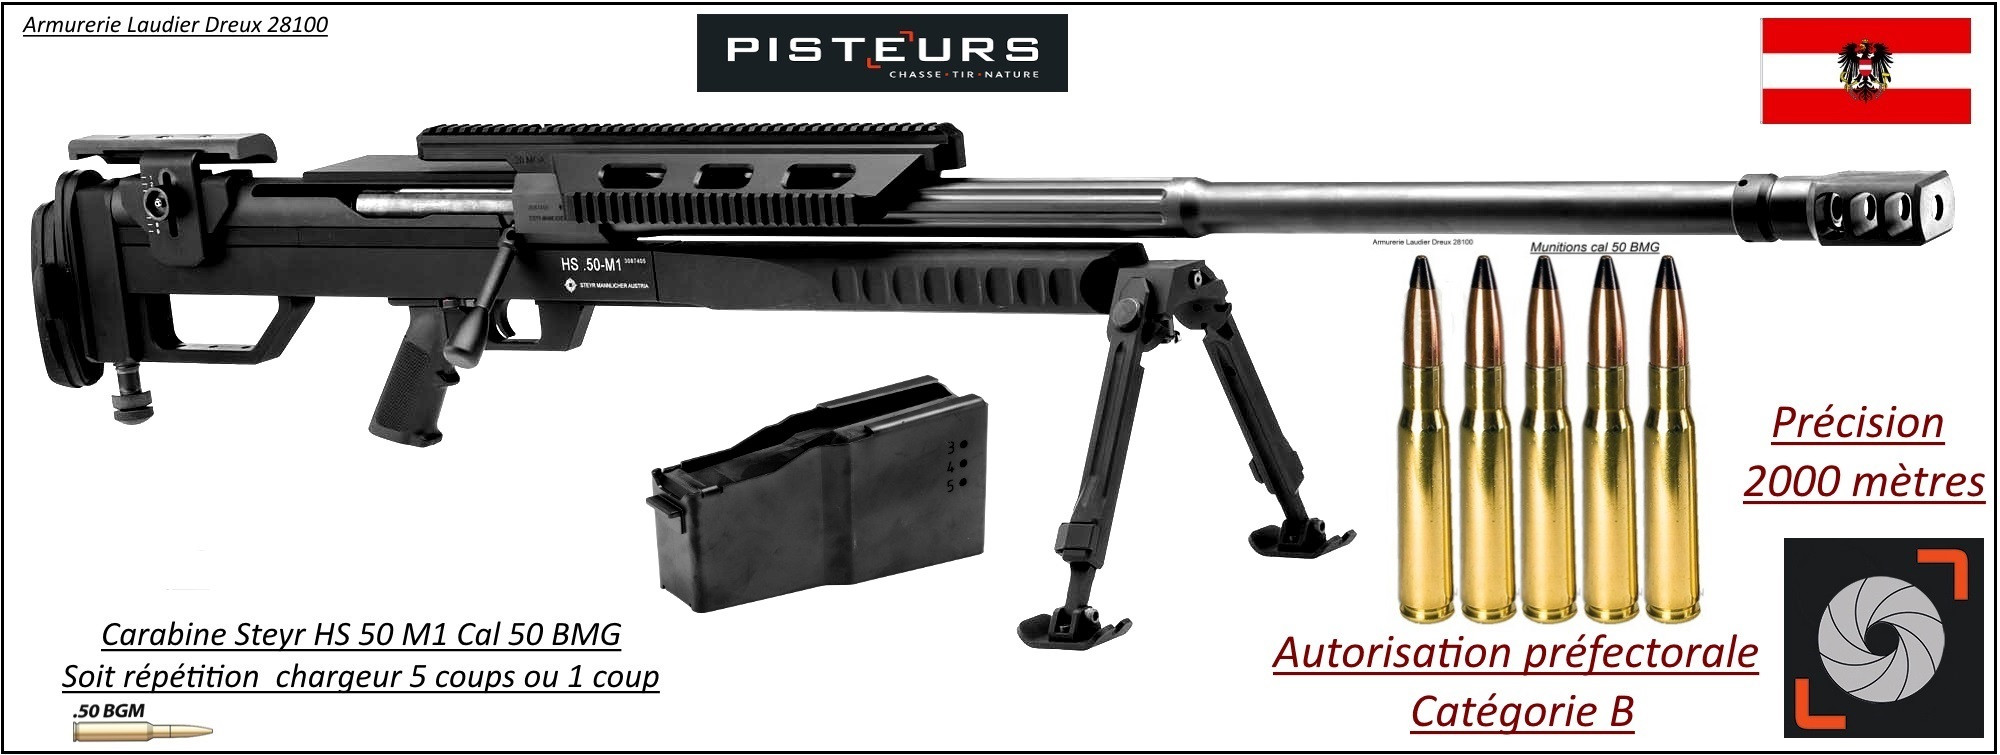 "Carabines Steyr Mannlicher HS 50 Calibre 50 BMG- 1 coup ou 5 coups-""Prix Promotion"""